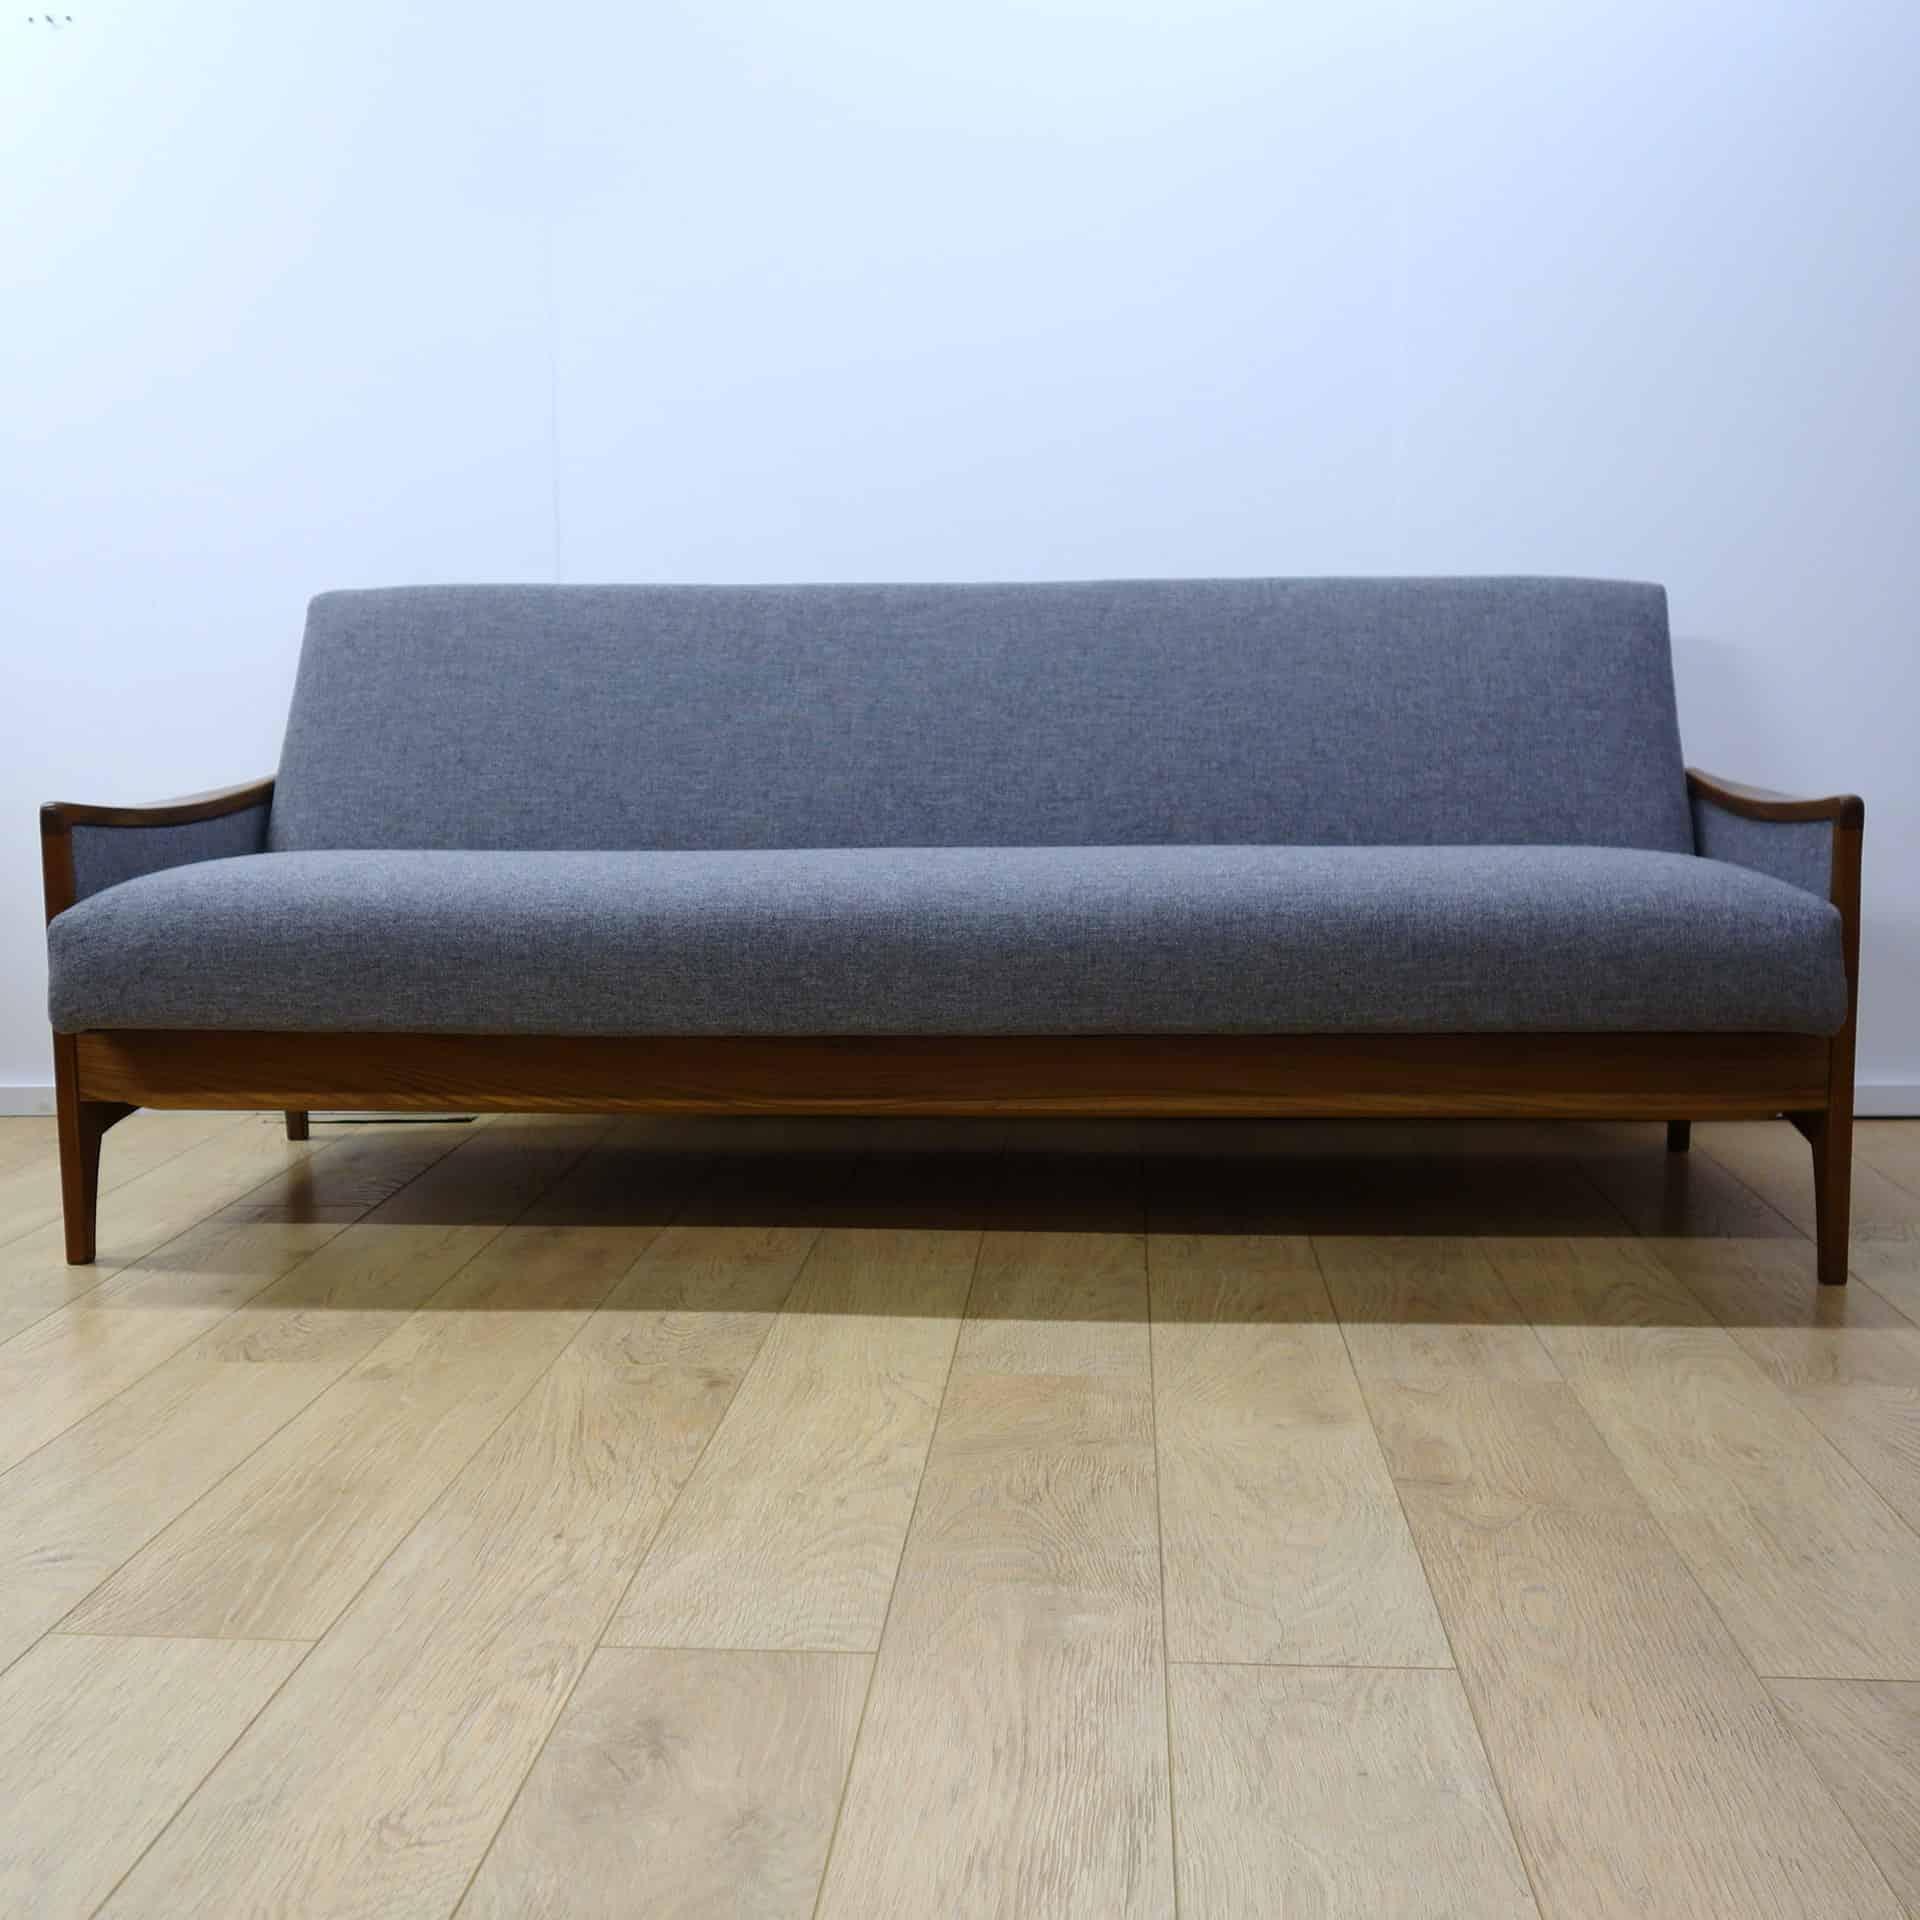 1960s Teak Sofabed By G Plan Mark Parrish Mid Century Modern